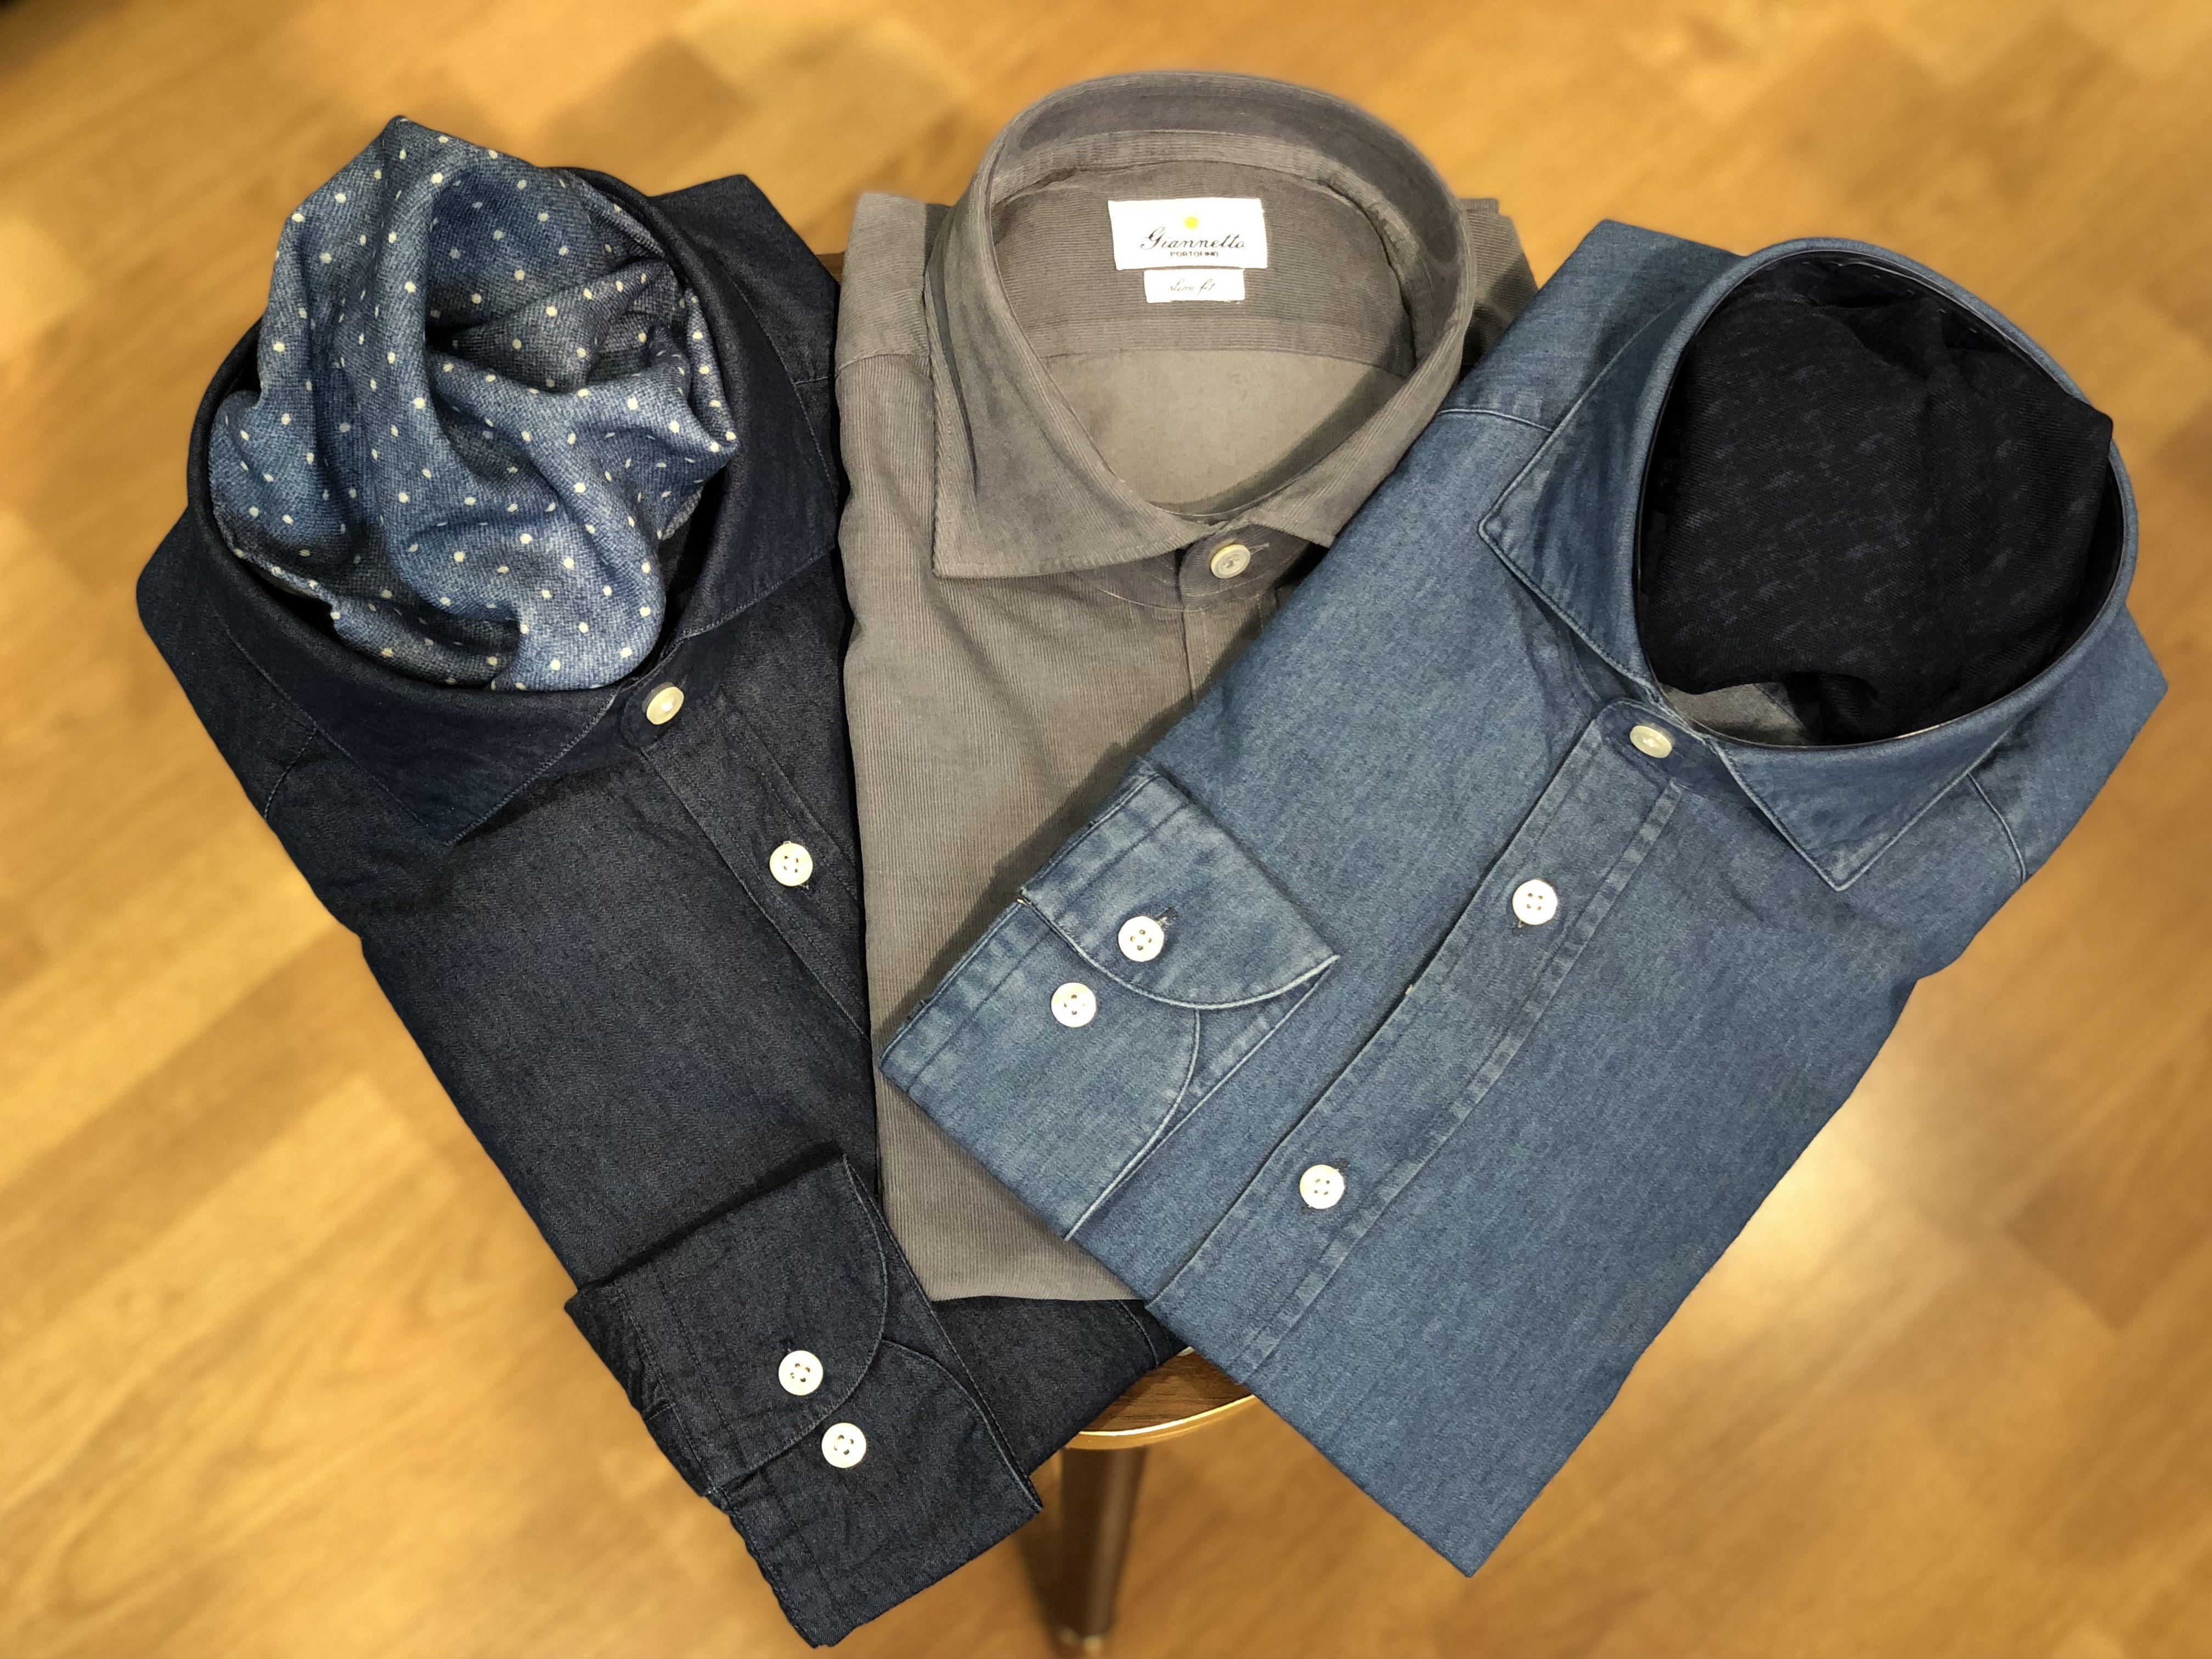 Chemises 1 - Christian Ambrosio